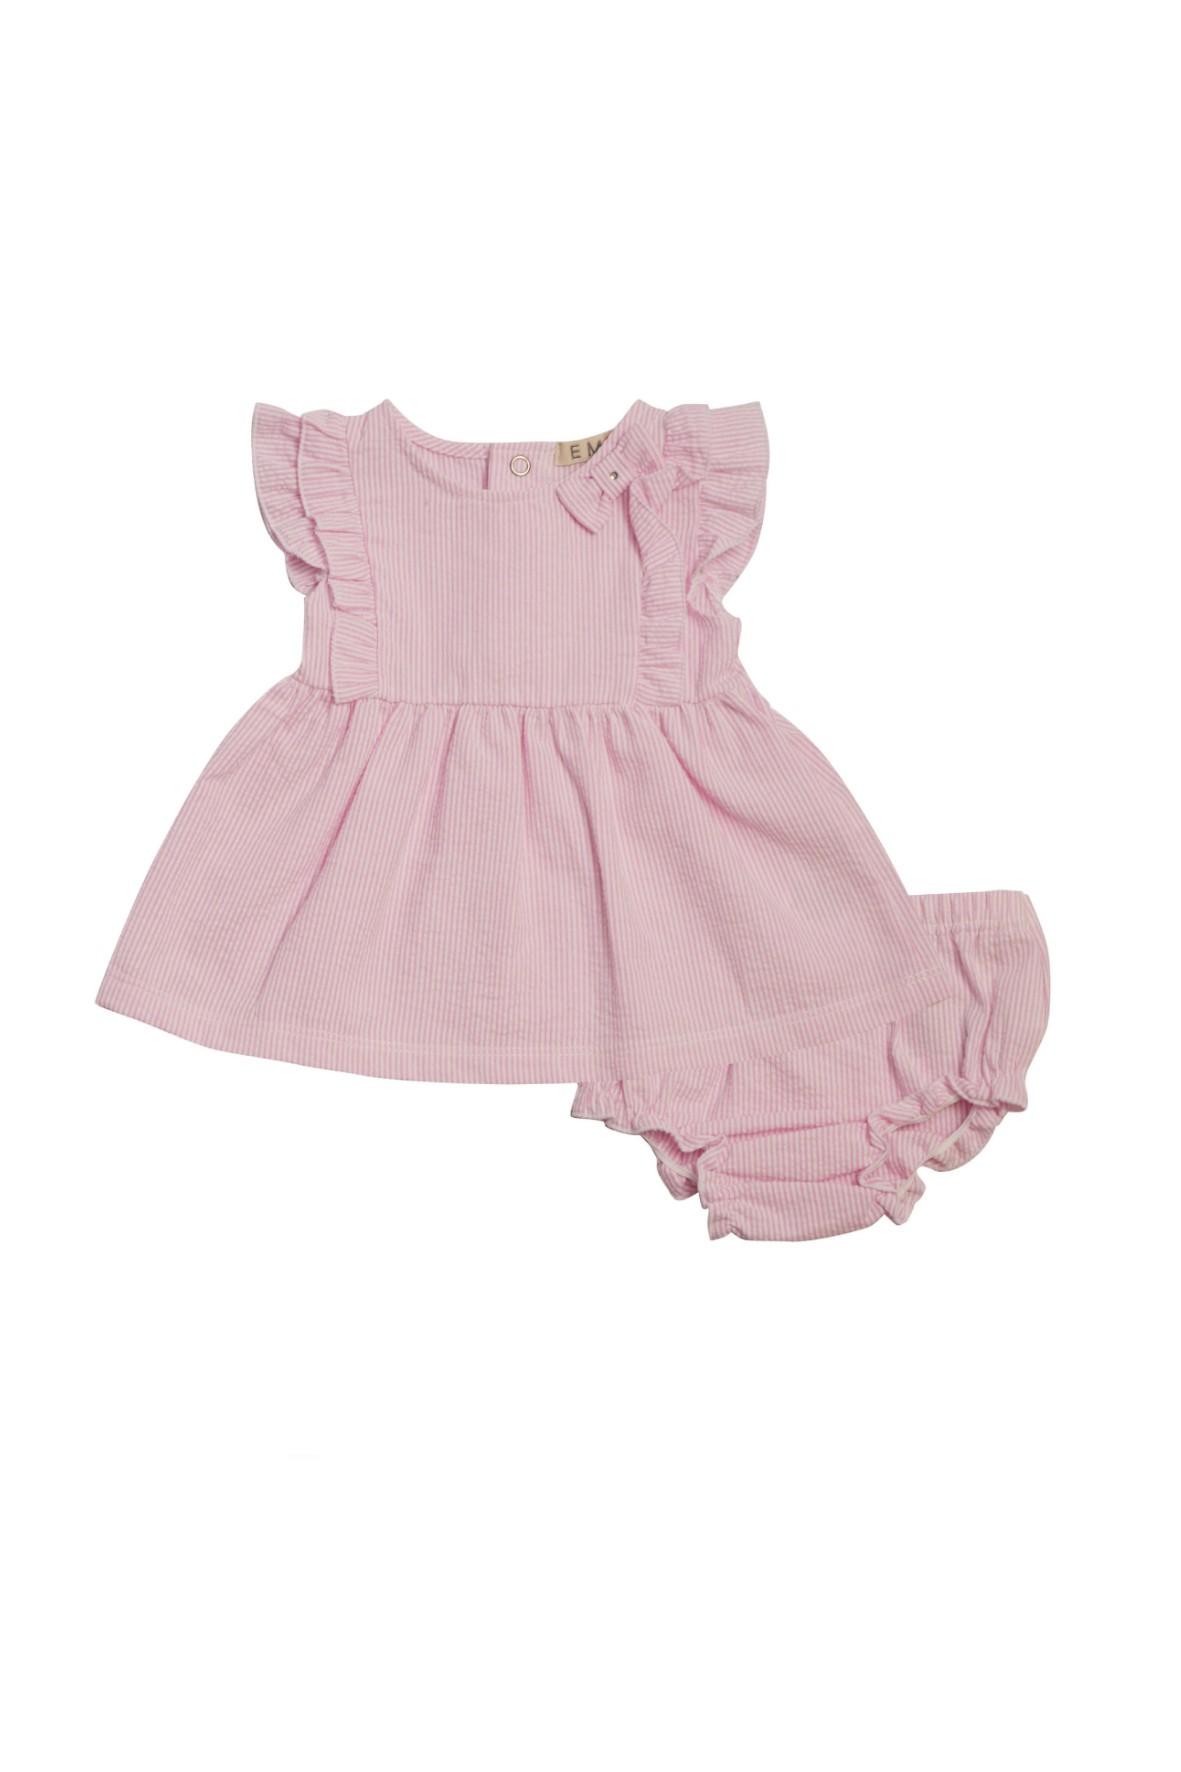 Sukienka i spodenki- komplet